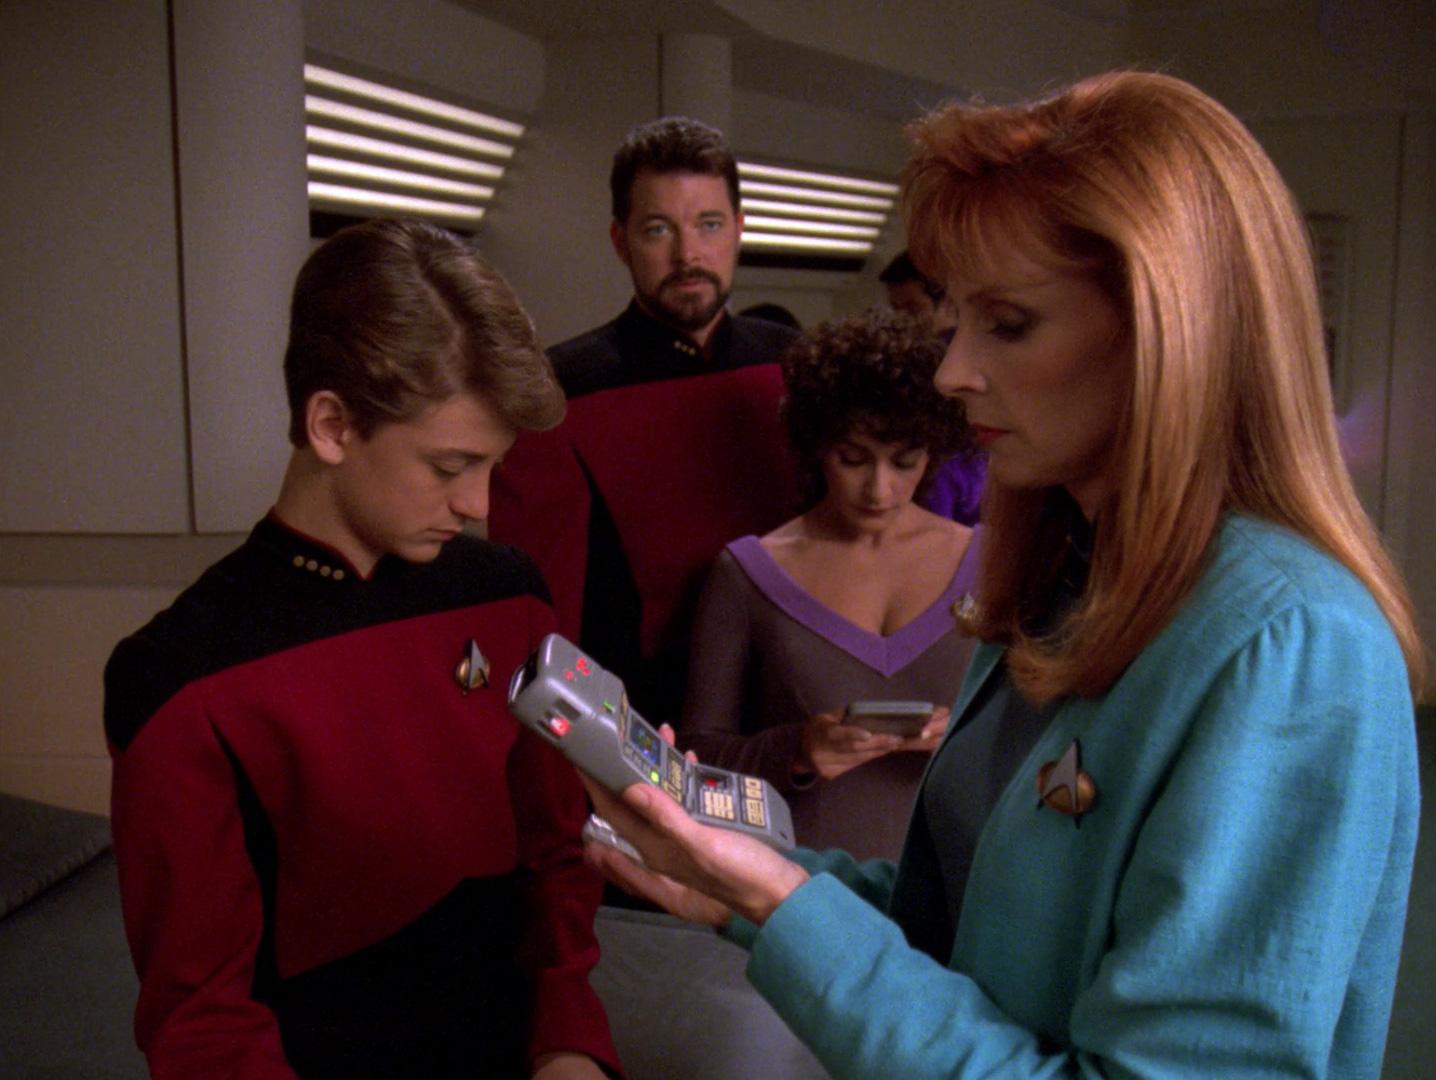 Crusher untersucht den jungen Picard.jpg